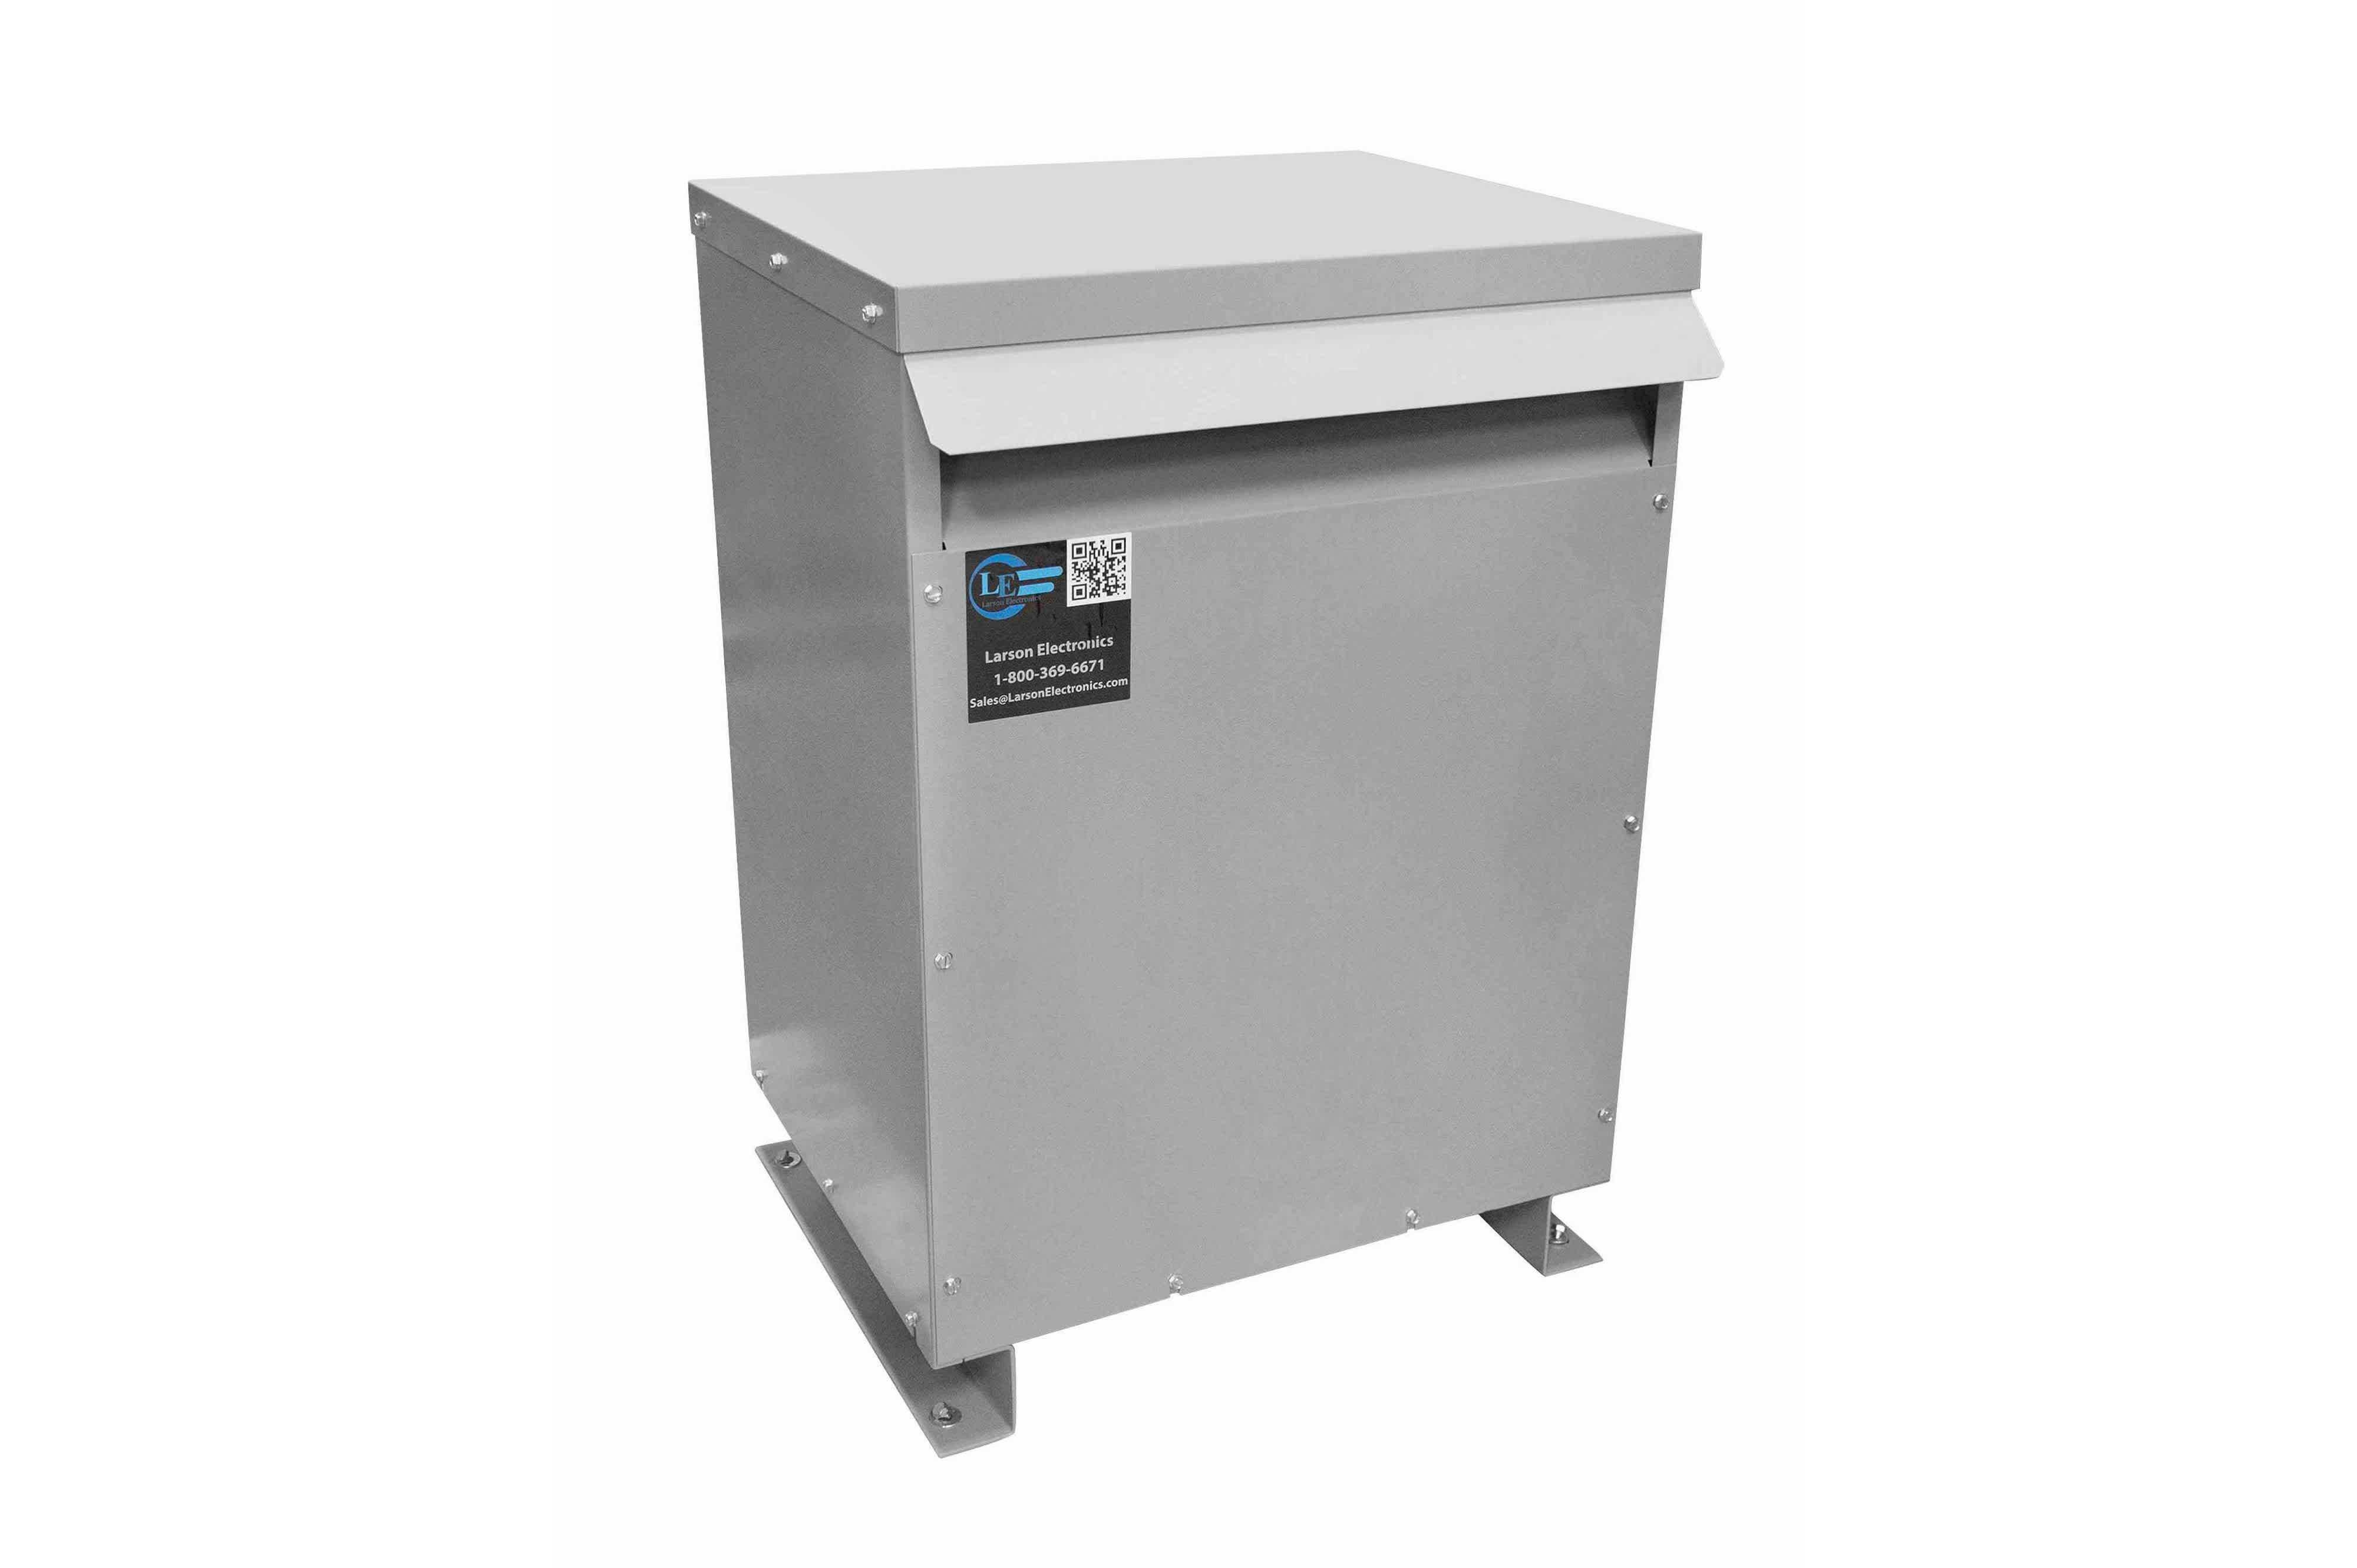 167 kVA 3PH Isolation Transformer, 600V Wye Primary, 460Y/266 Wye-N Secondary, N3R, Ventilated, 60 Hz